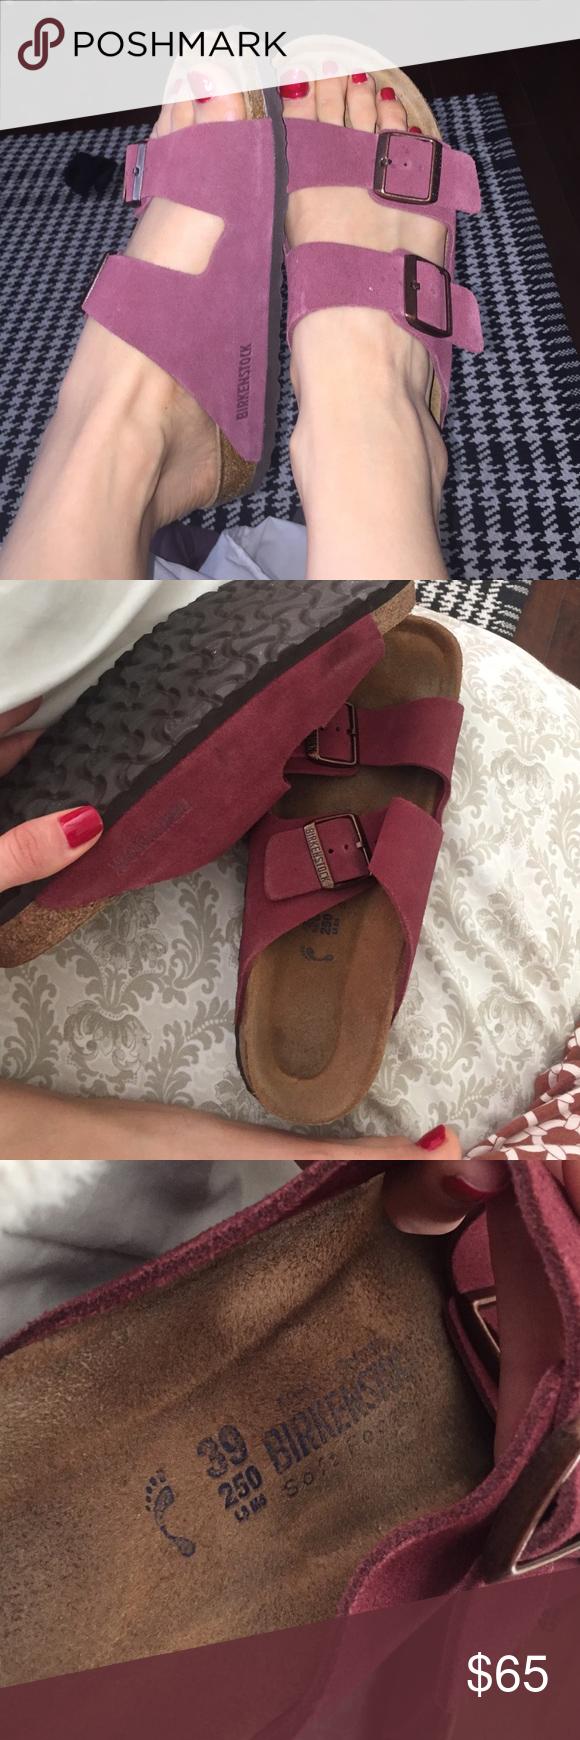 Suede Birkenstocks Burgundy / Maroon Burgundy Suede Birkenstocks - fairly new condition! Birkenstock Shoes Sandals